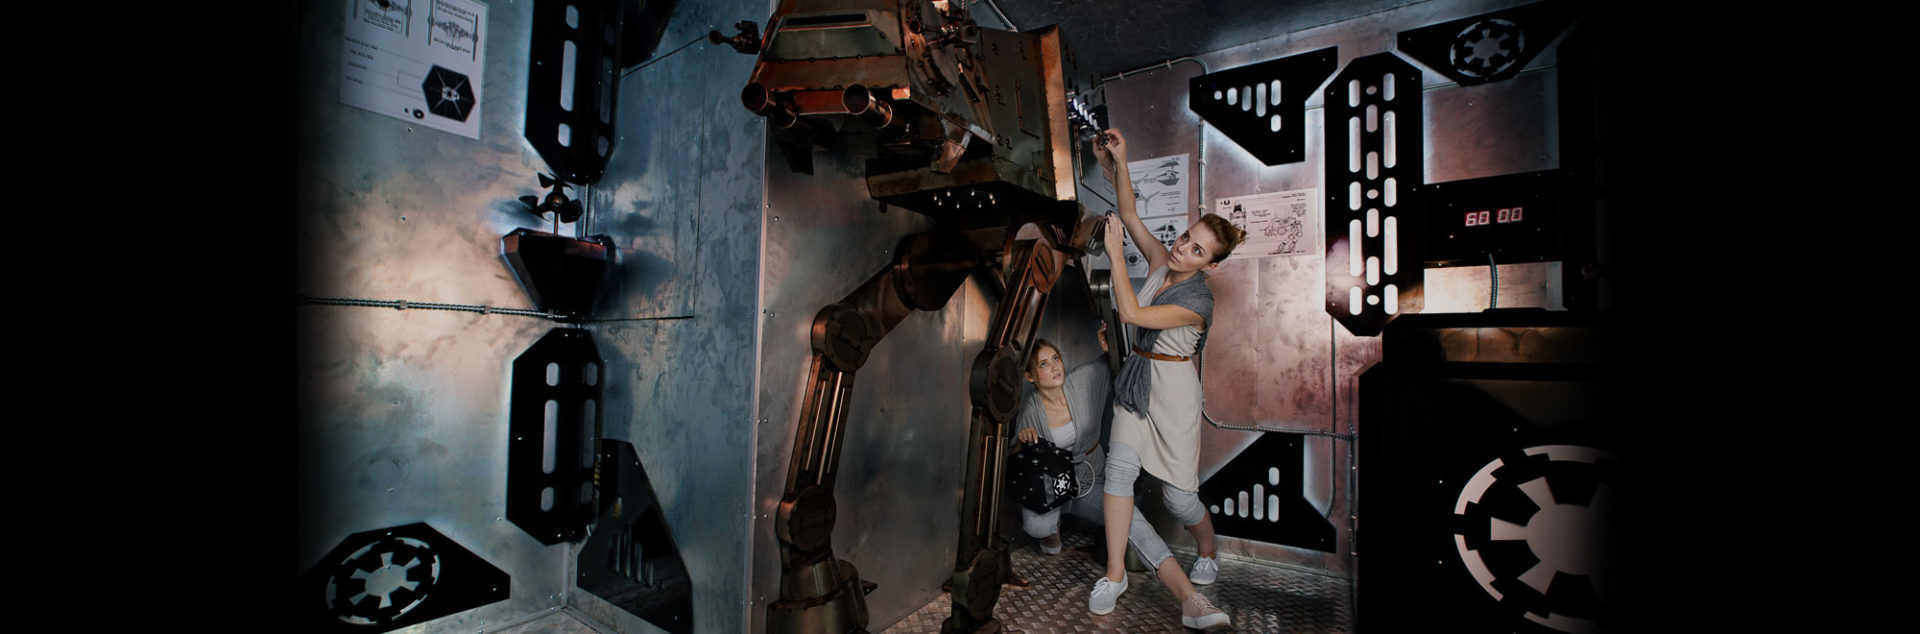 Квест комната Звездные войны - АТ-АТ фото